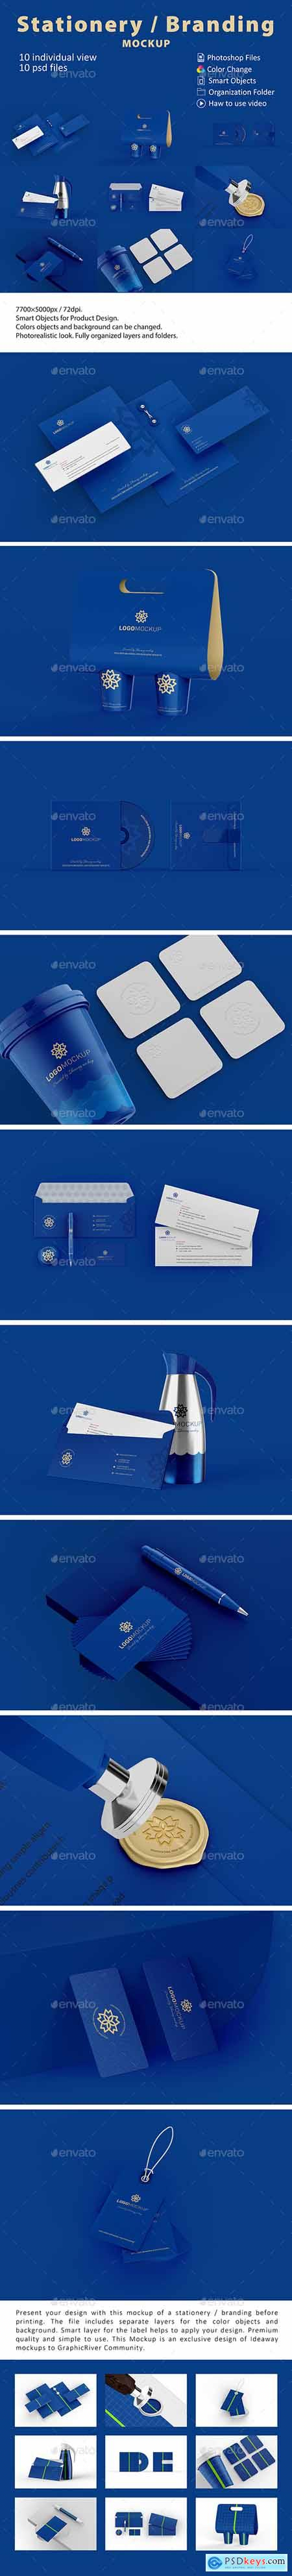 Graphicriver Stationery Branding Mockup